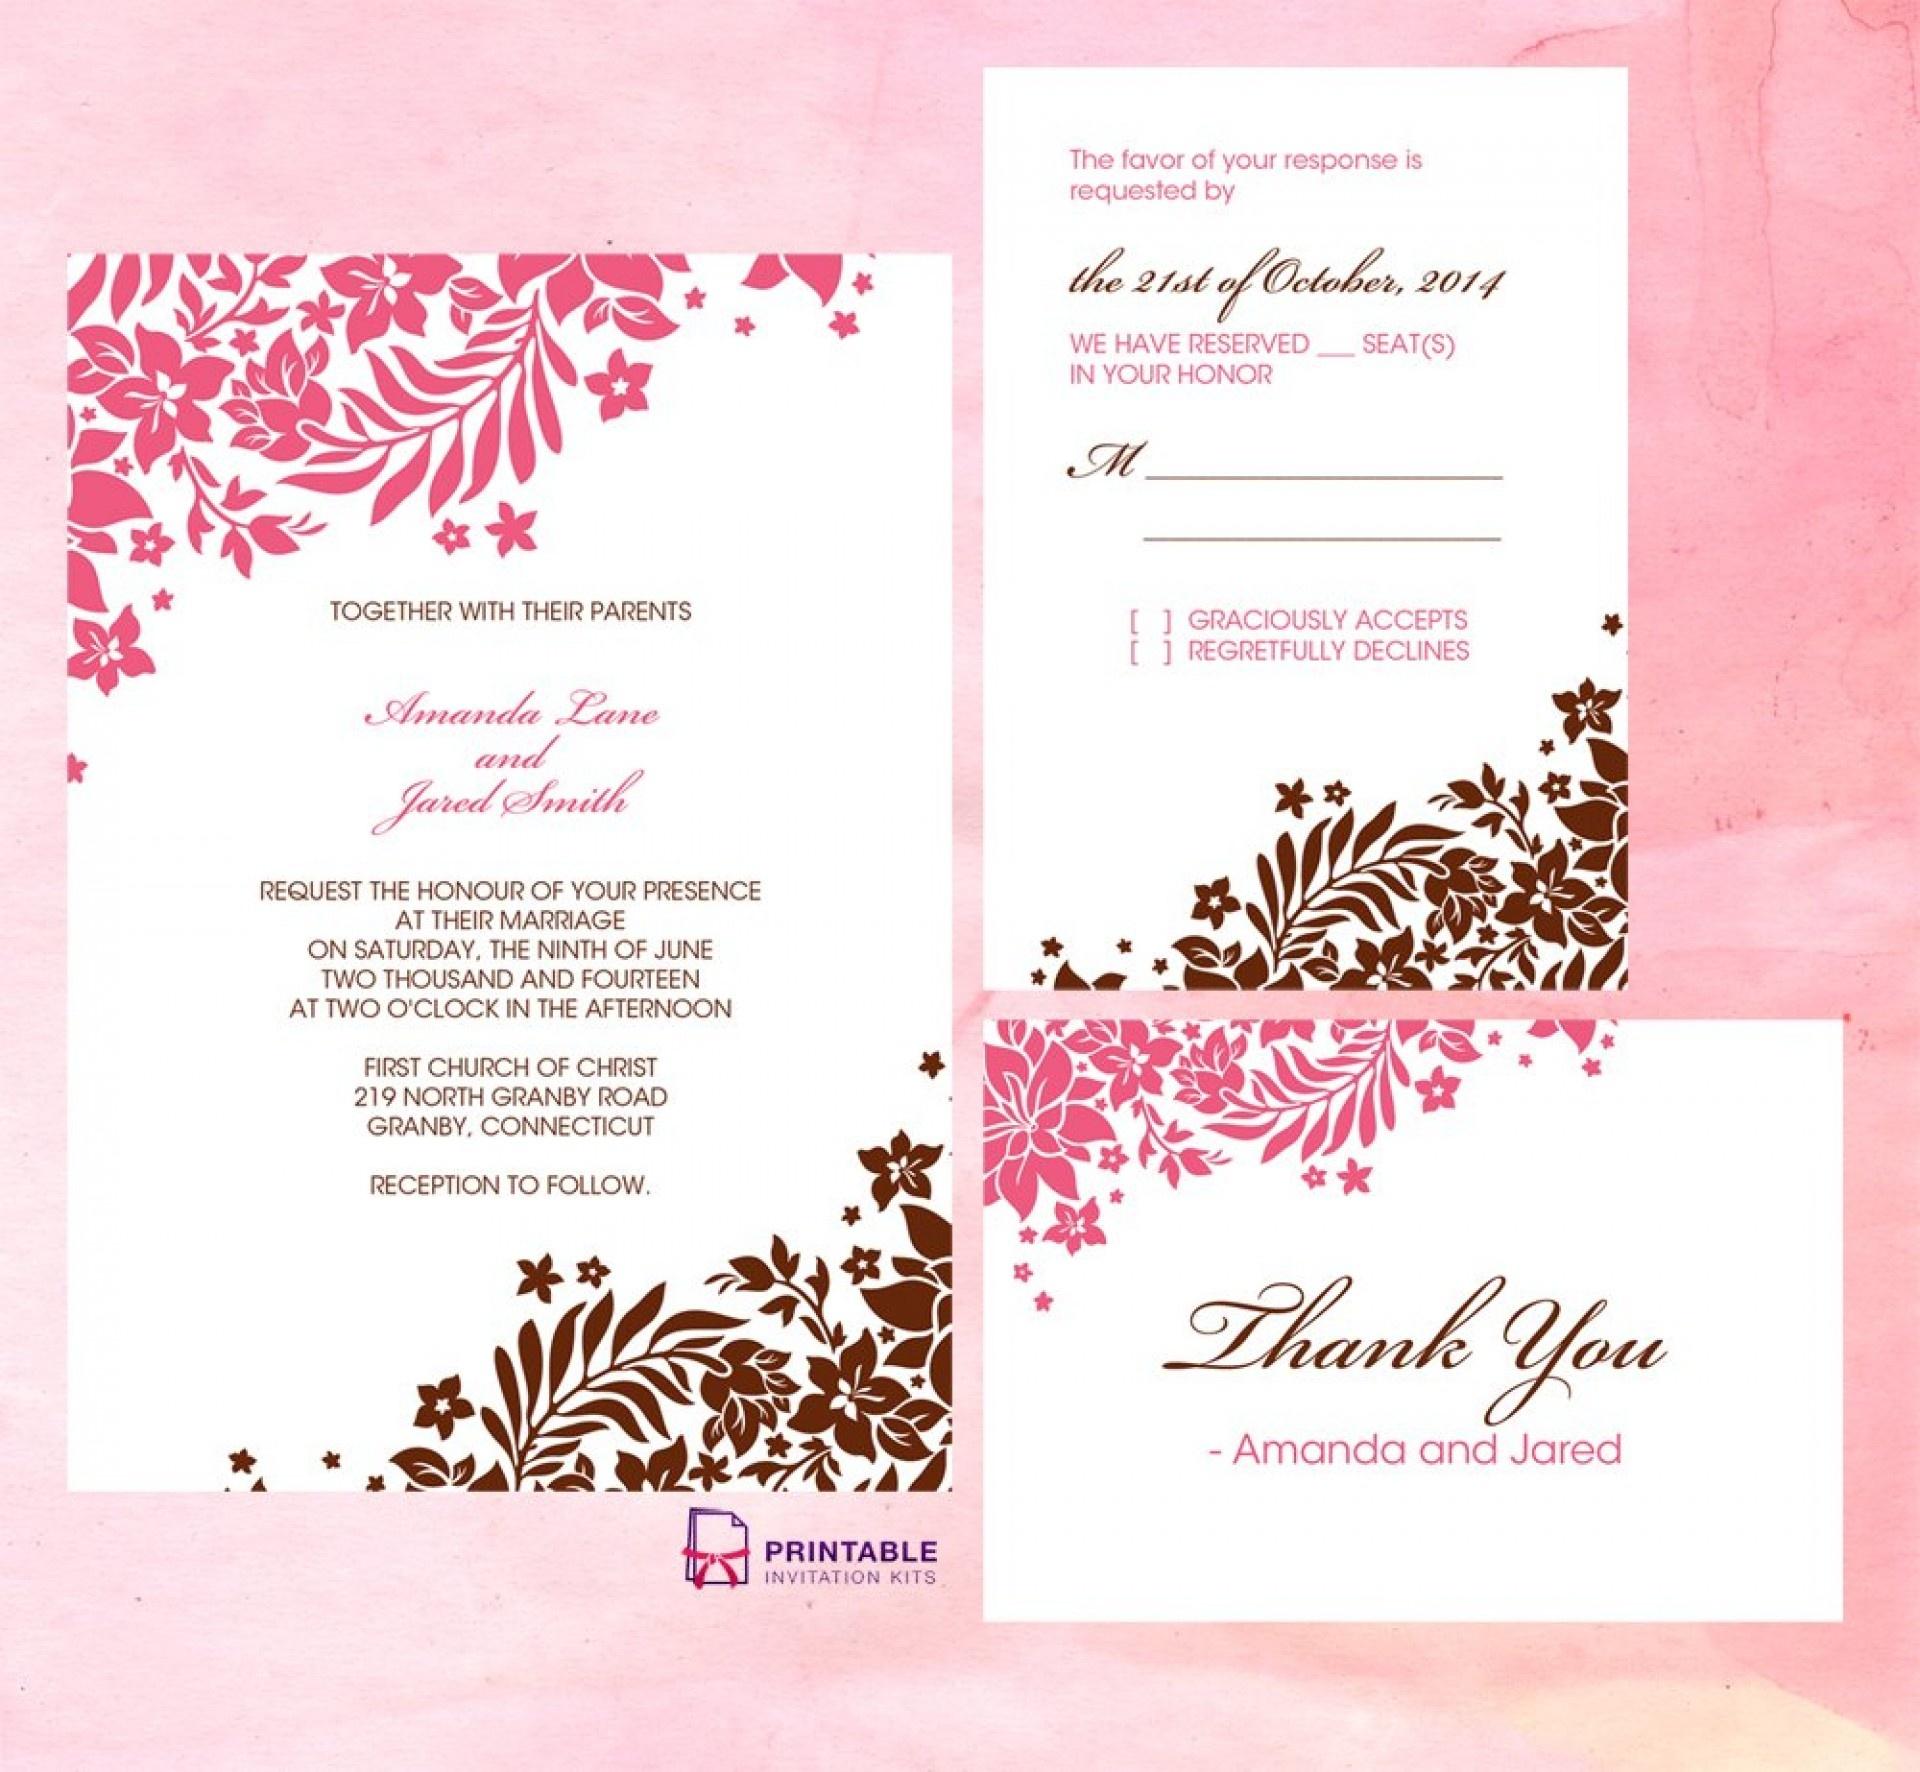 Wedding Invitation Templates Free Download Remarkable Free - Wedding Invitation Cards Printable Free